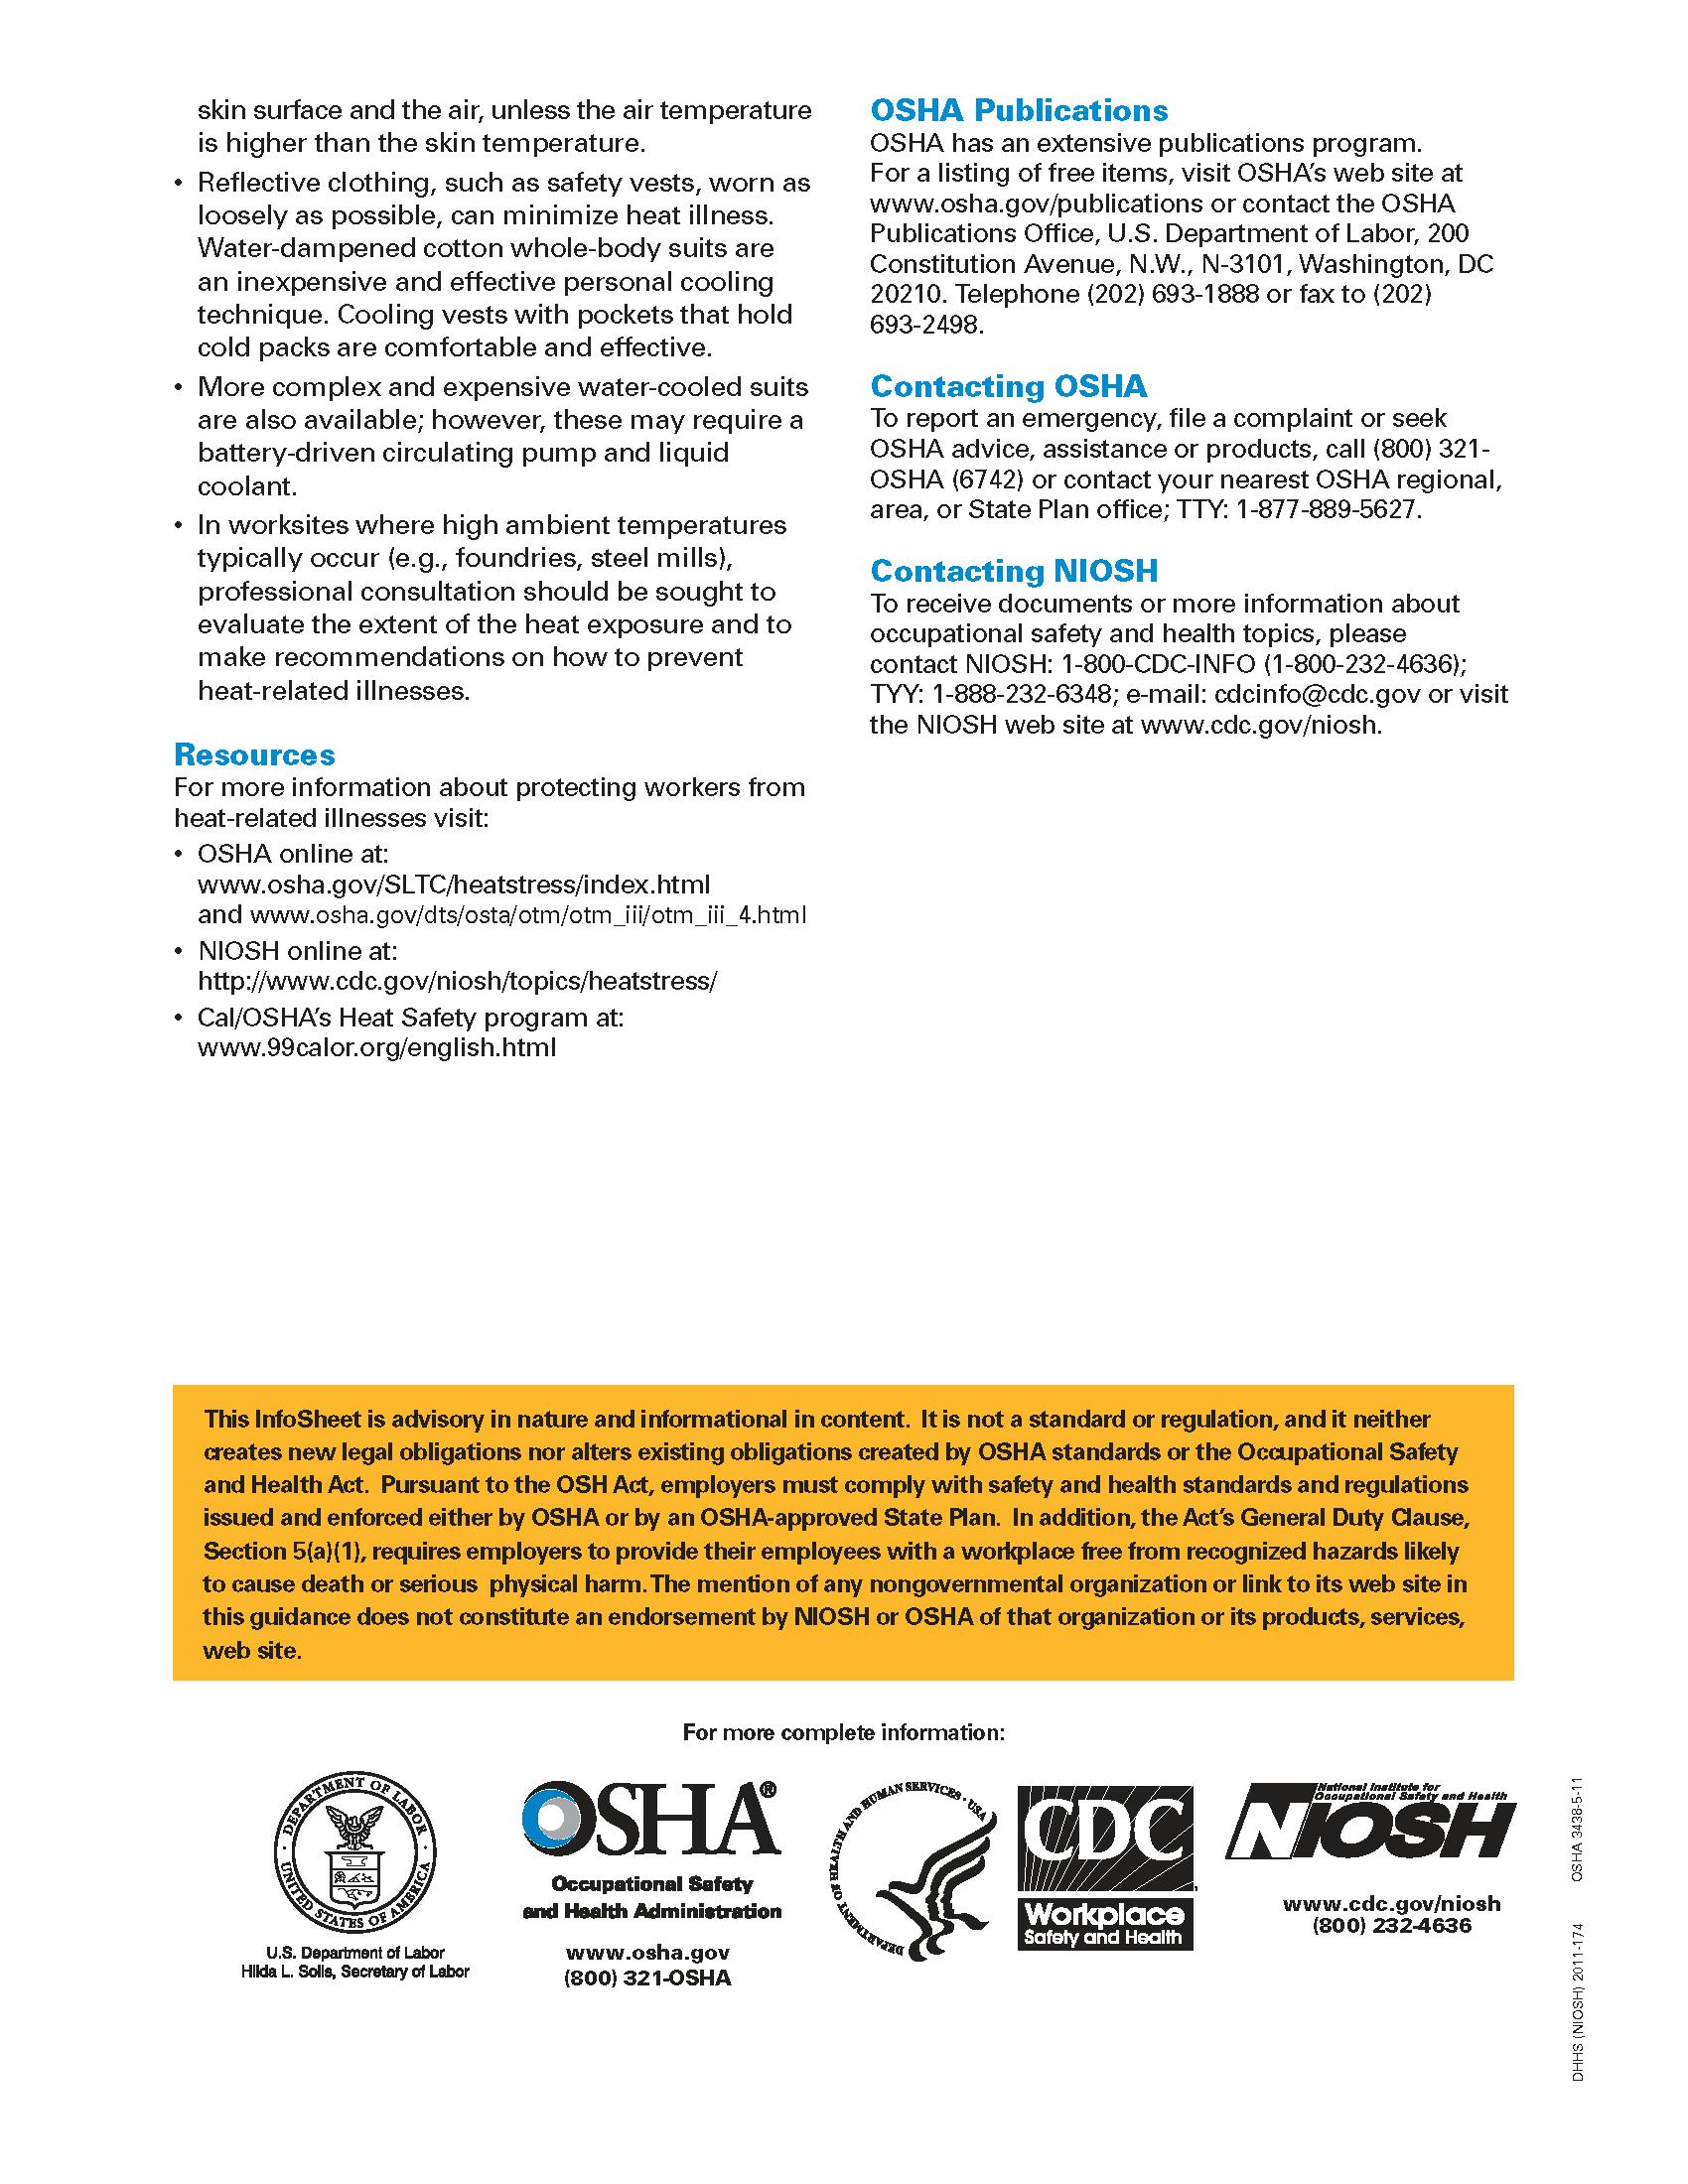 http://www.ibew683.org/Uploads/UploadedFiles/2019_OSHA_Heat_Stress_Fact_Sheet_Page_3